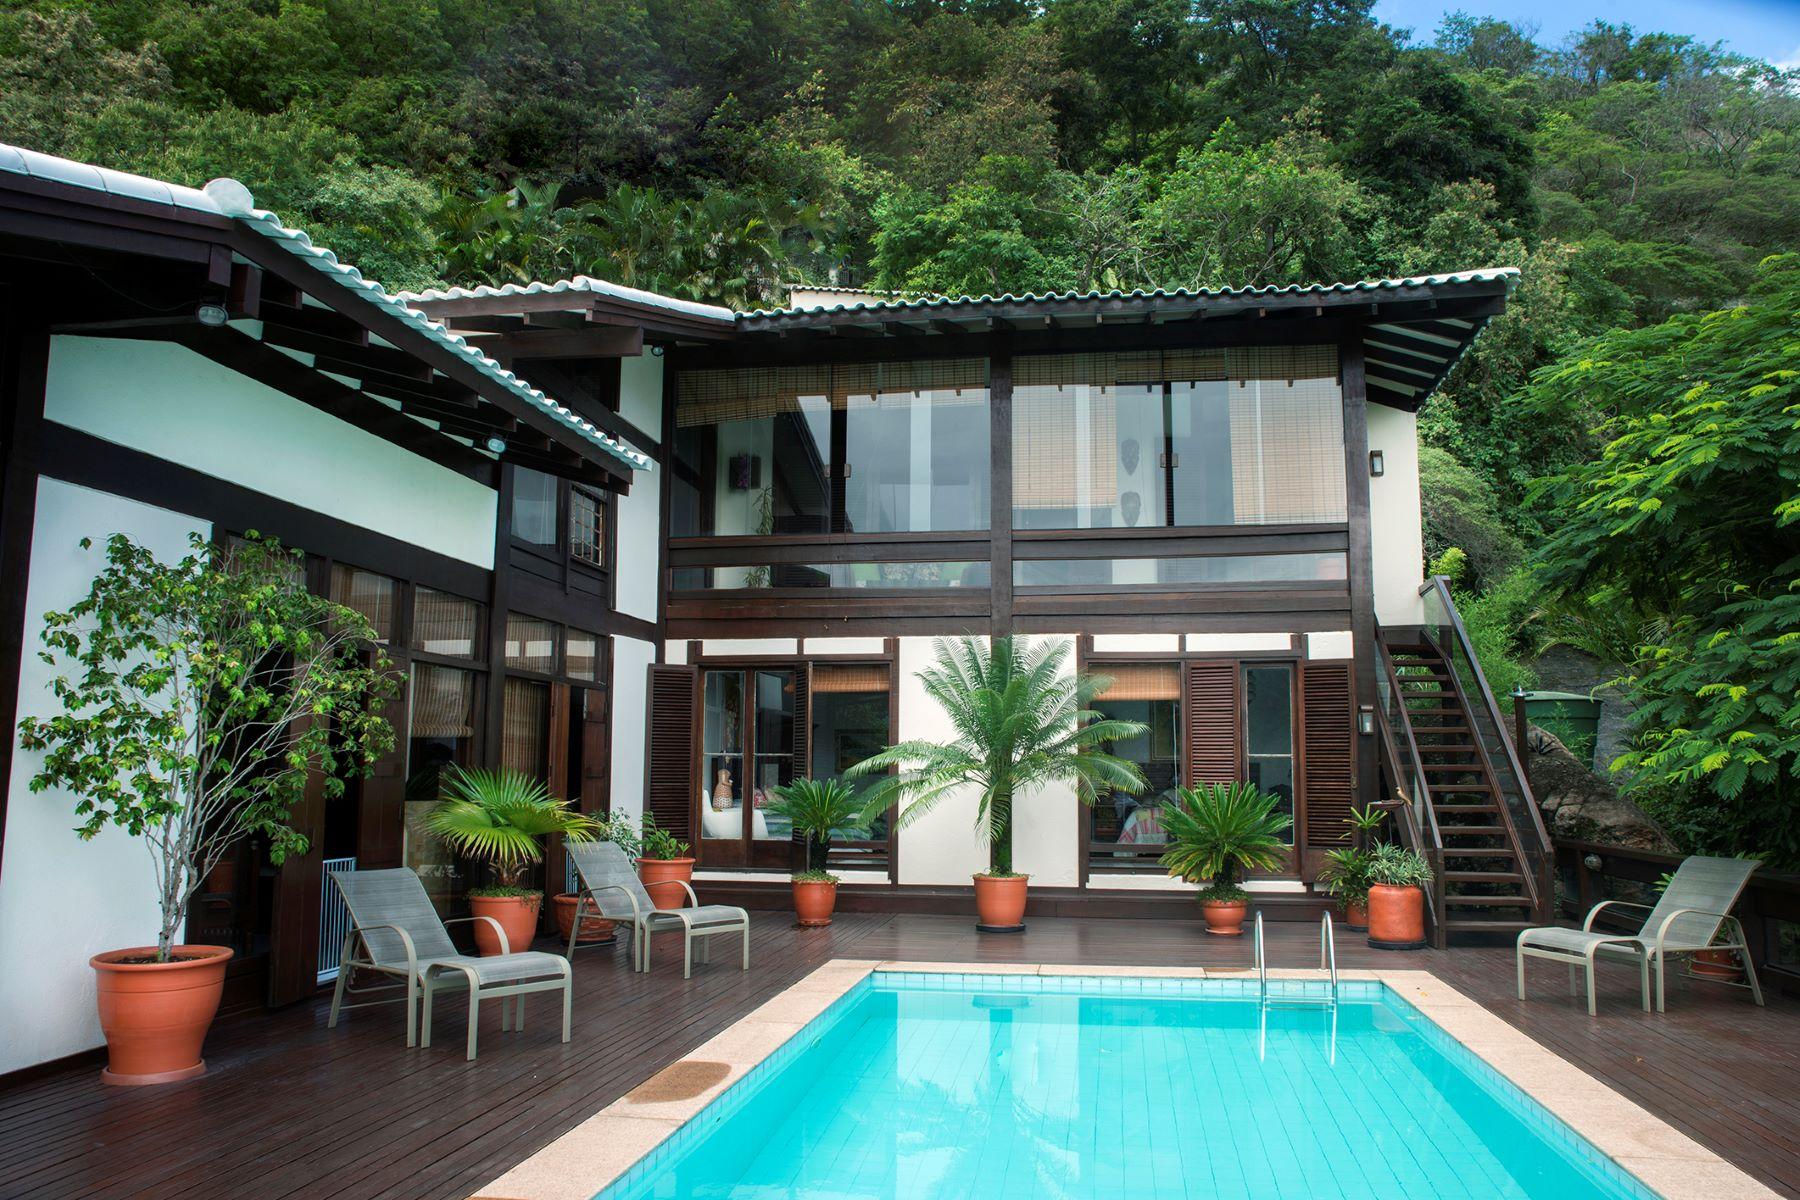 Nhà ở một gia đình vì Bán tại Project by Zanine Caldas Rua José Condé Rio De Janeiro, Rio De Janeiro, 22641-030 Brazil